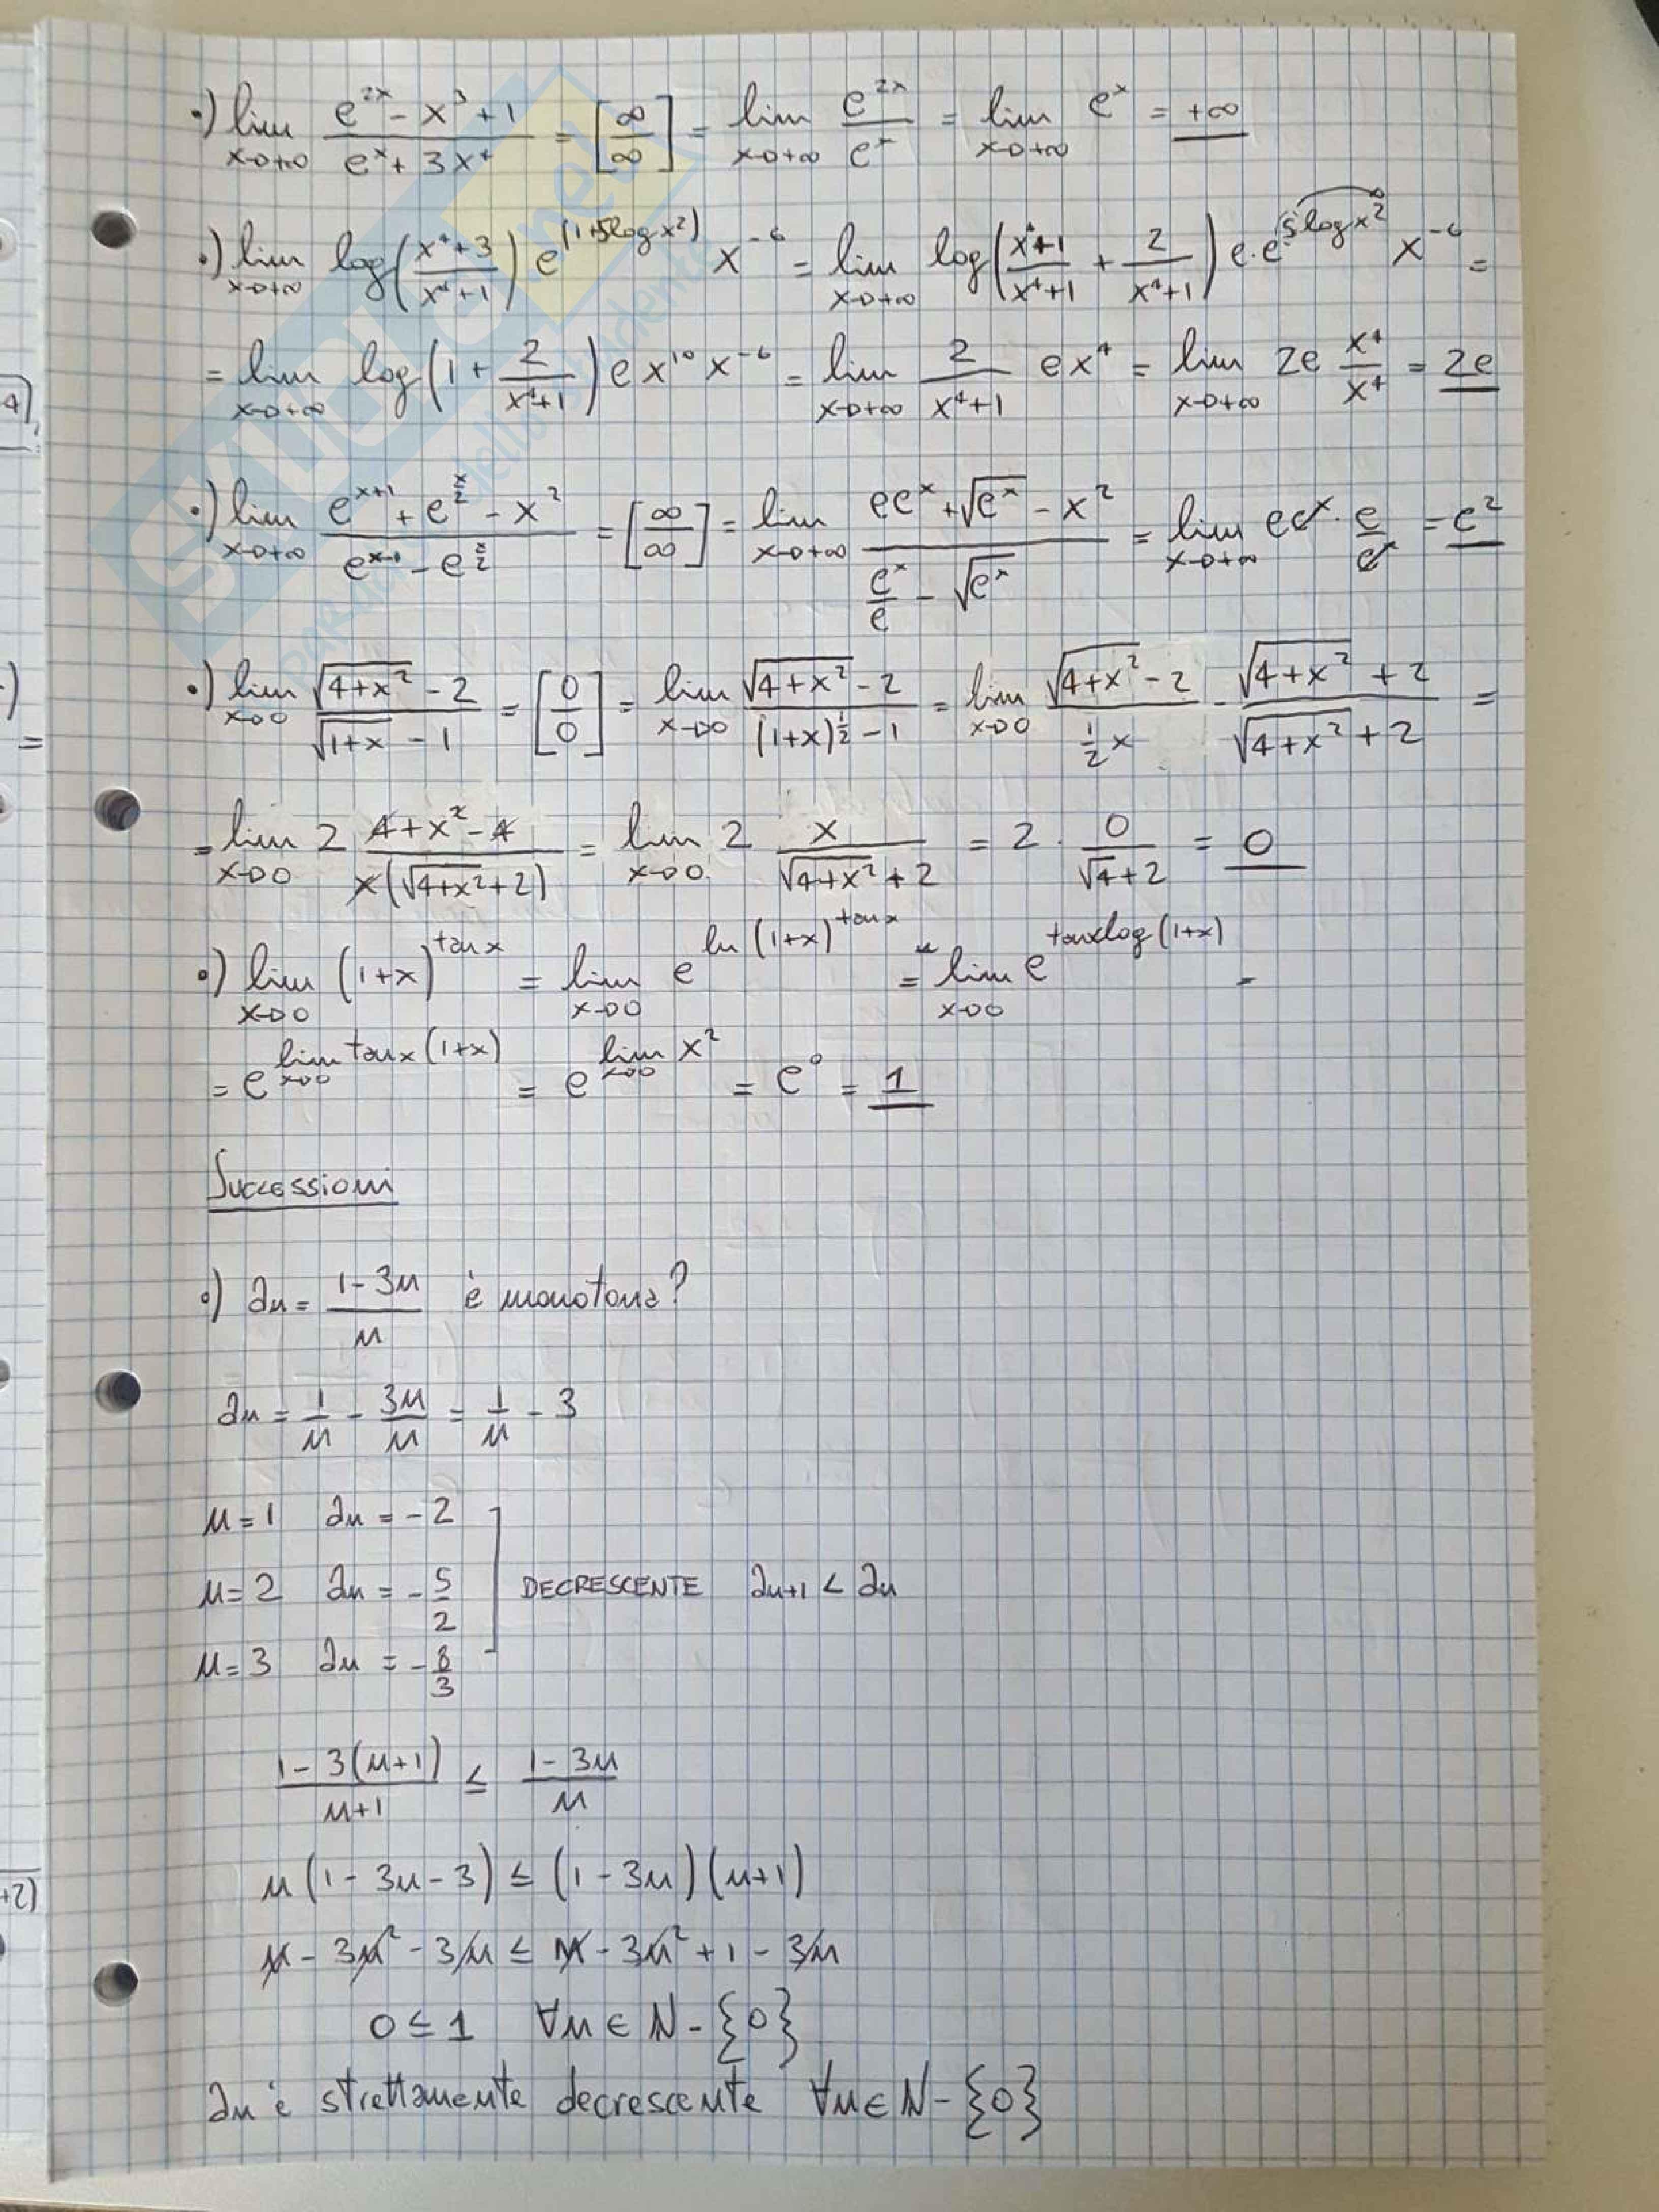 Appunti di Analisi e Geometria 1 - Esercitazione Pag. 31